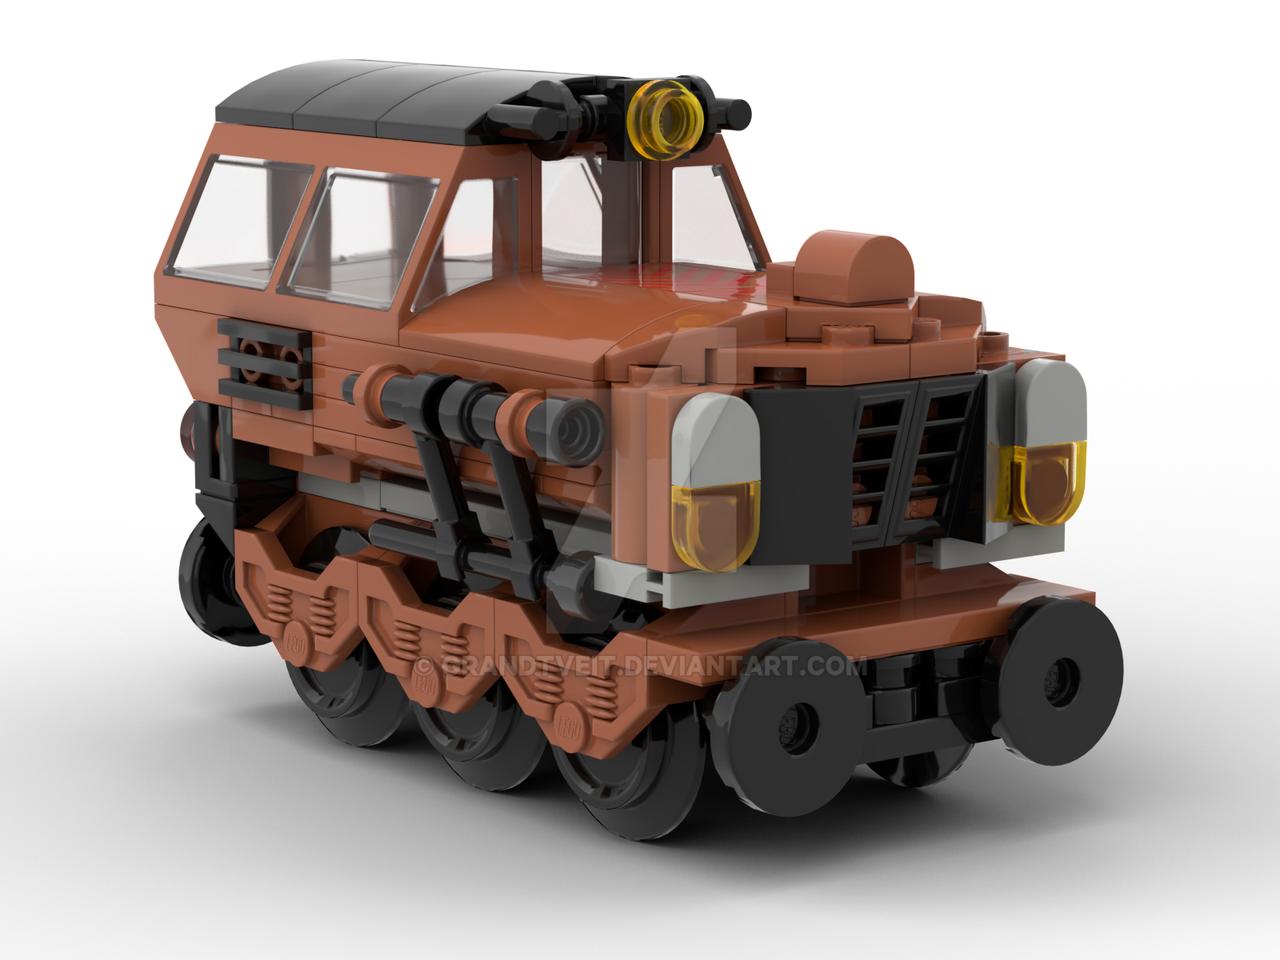 B0-W5 MK1 Orange Diesel Train Lego MOC by GrandTveit on